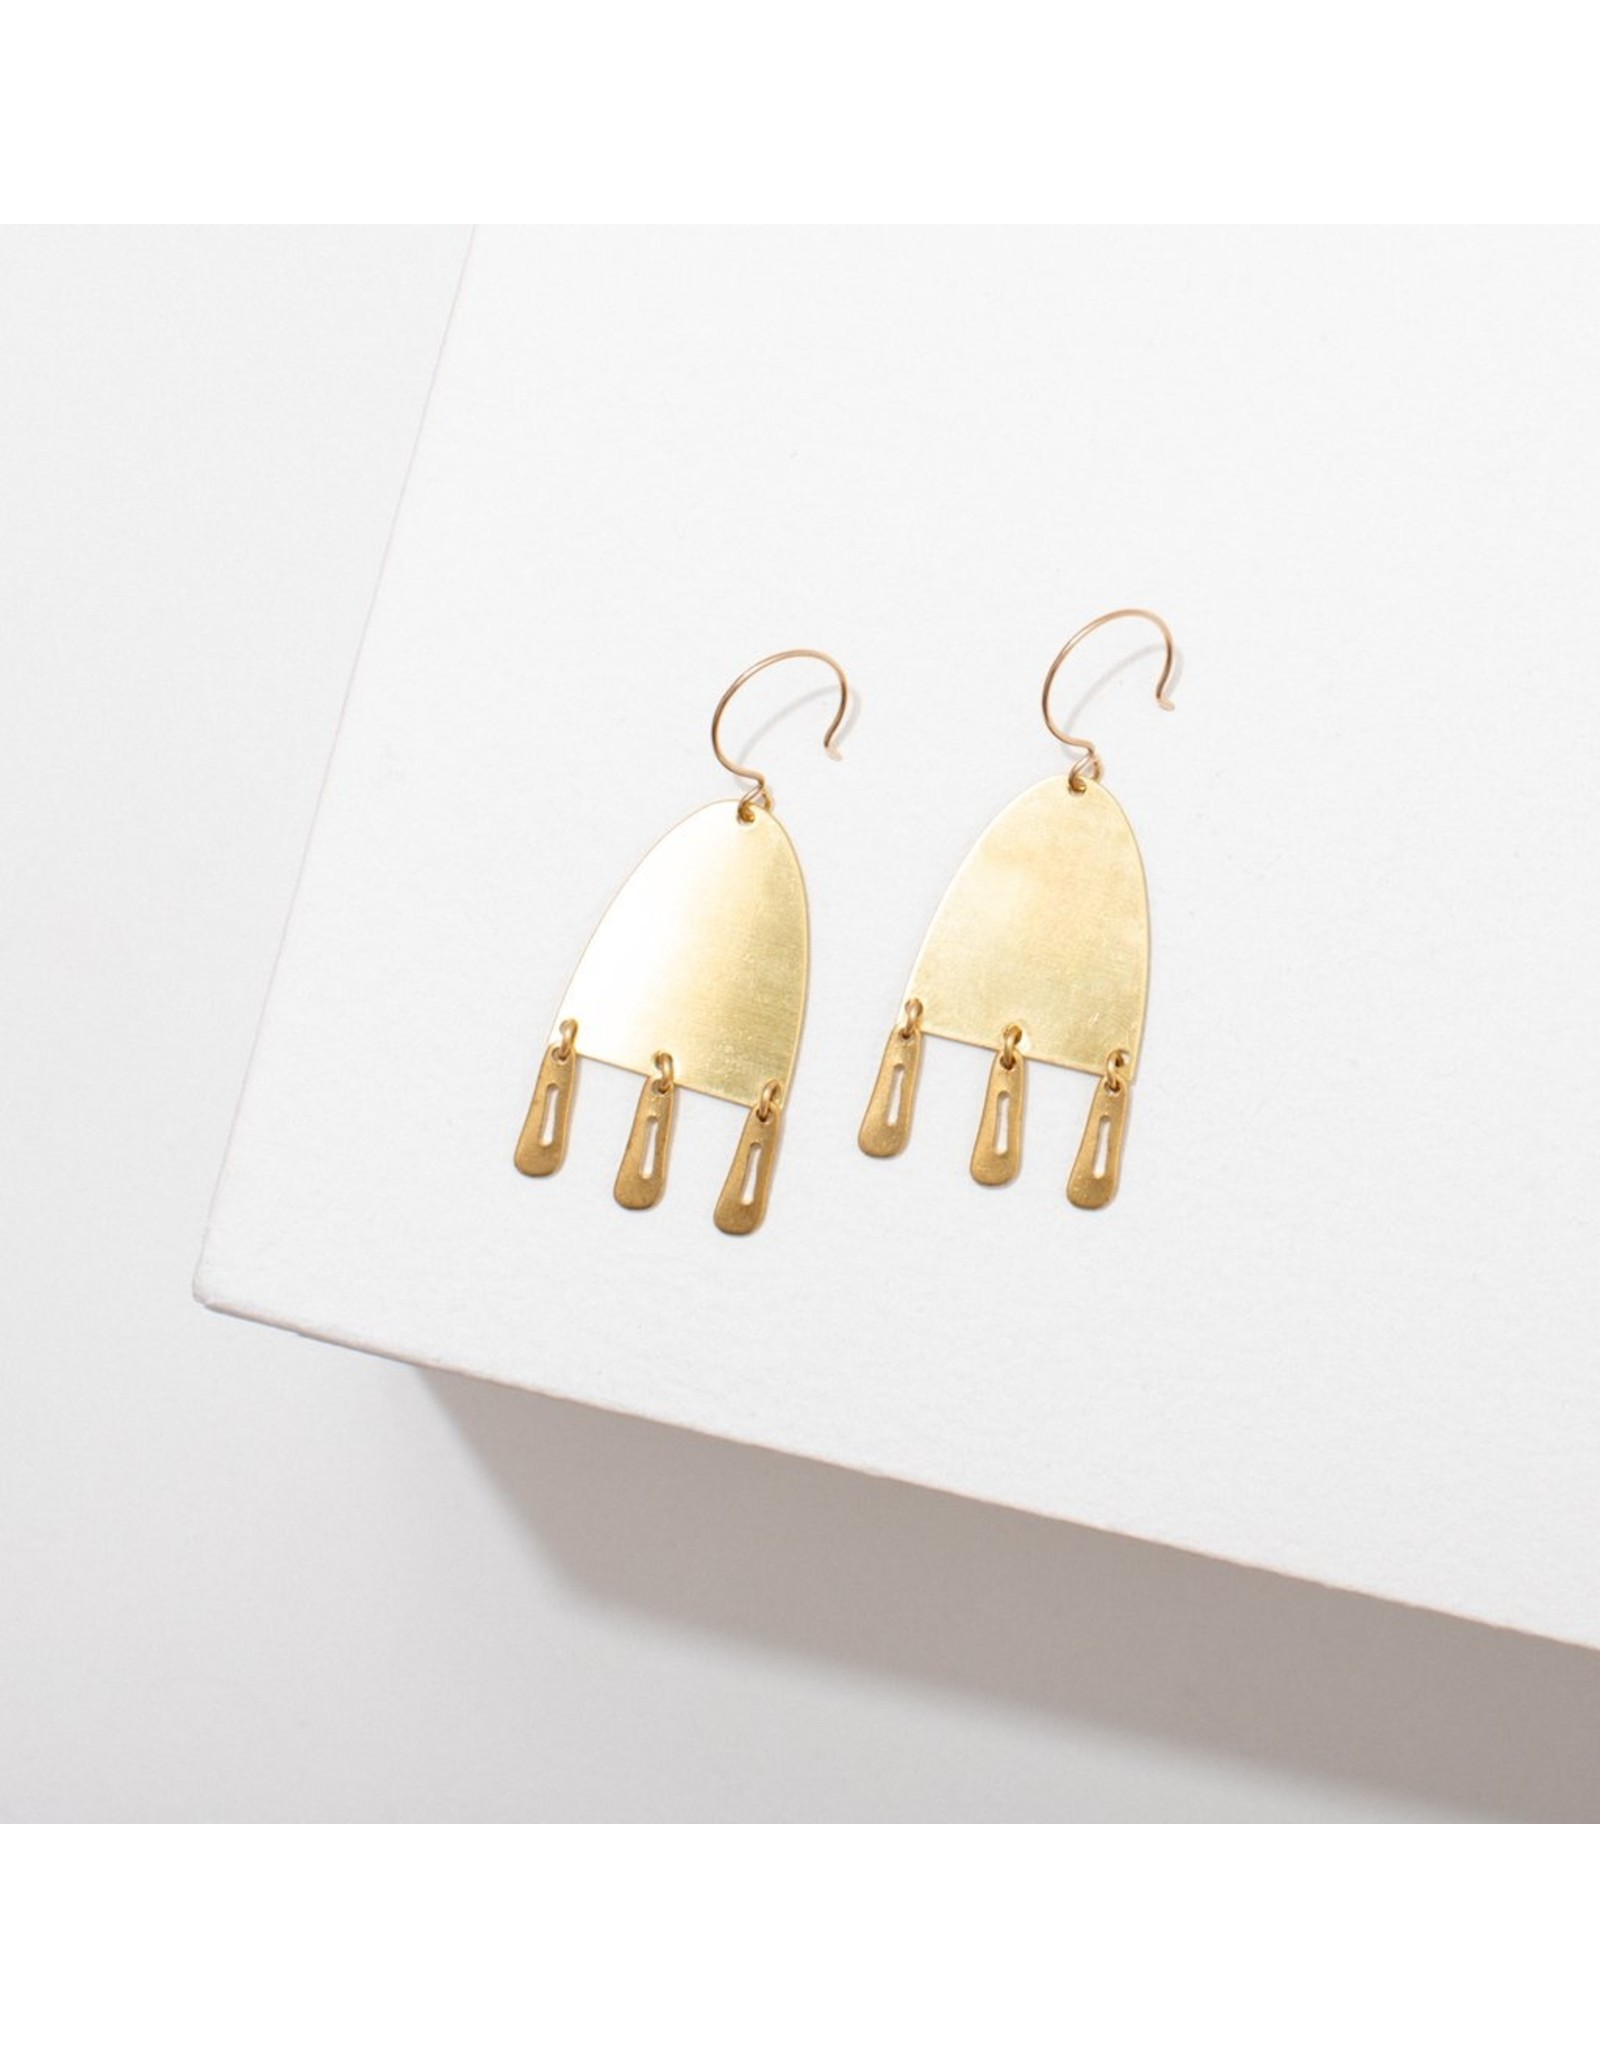 Larissa Loden Haworth earrings